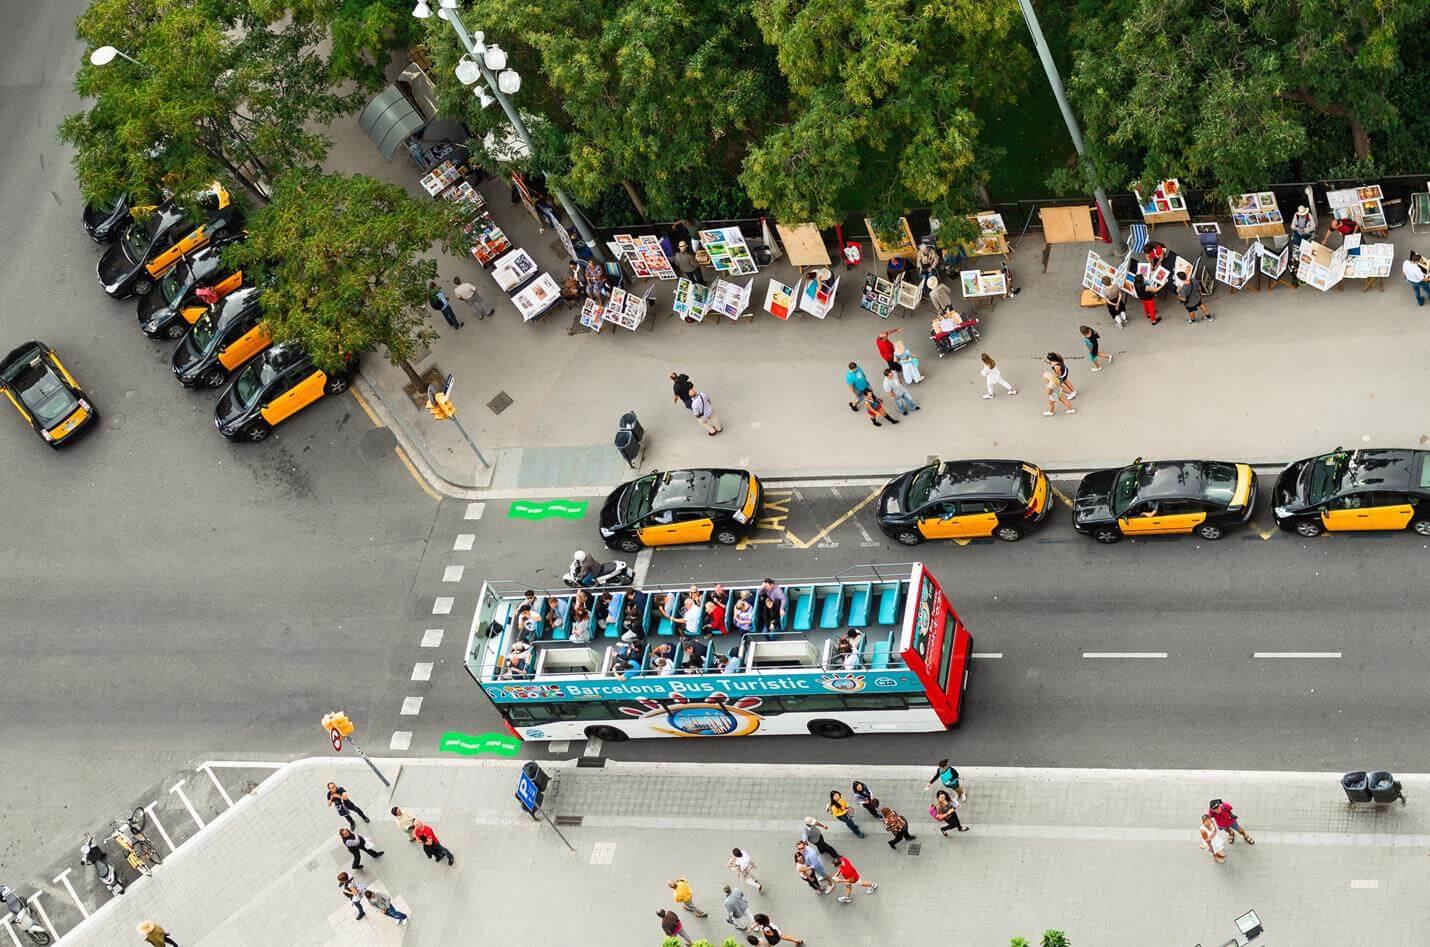 Hop On Hop Off Bus Barcelona - Top